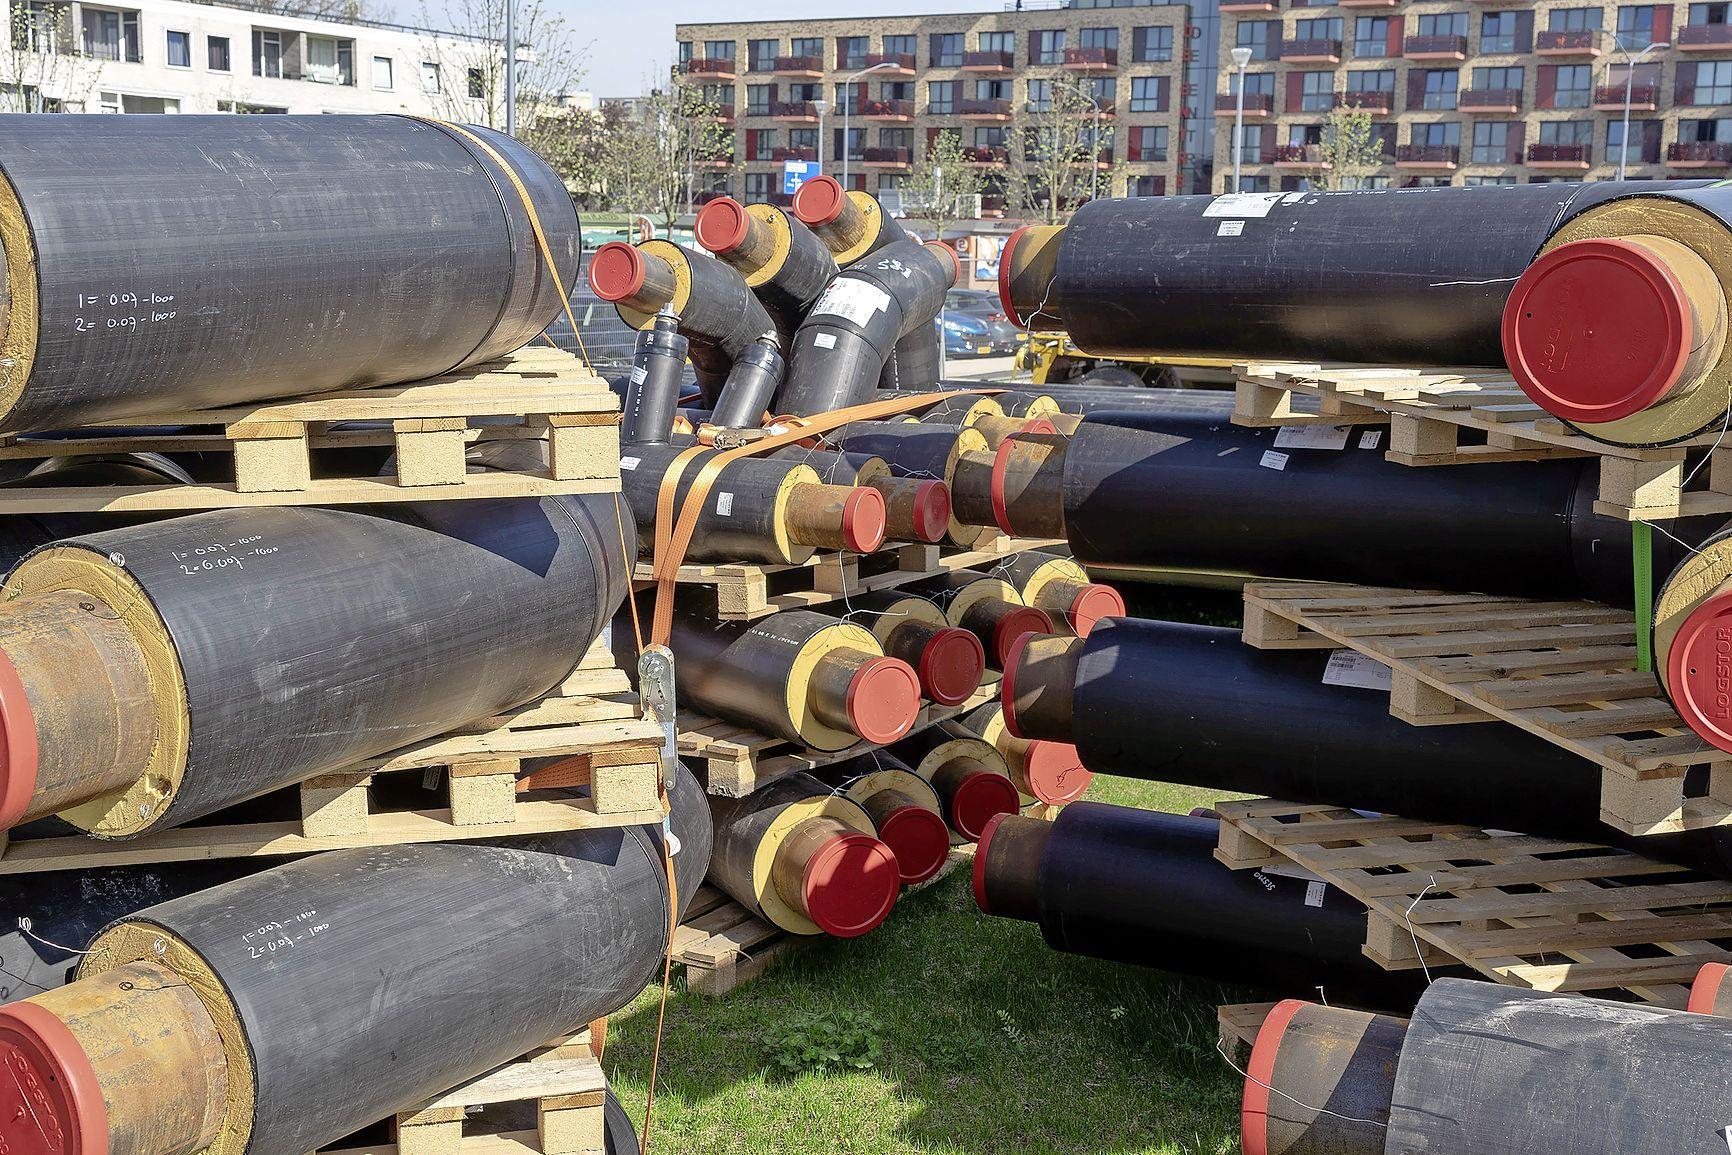 Velsen gaat in stapjes van het aardgas af [video]